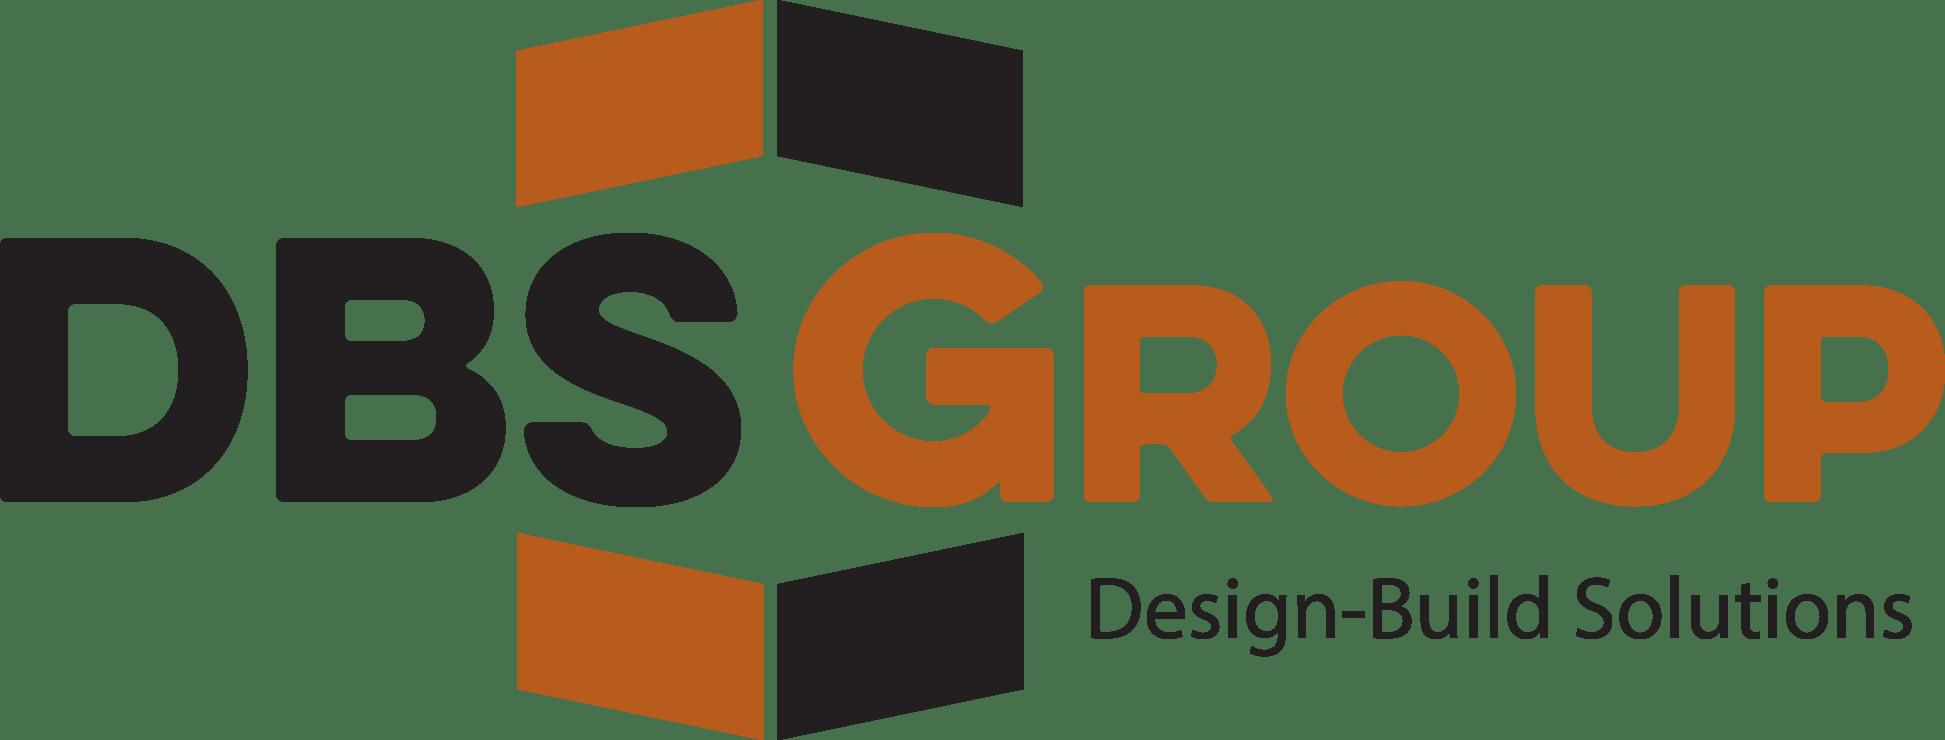 DBS-Group-Logo